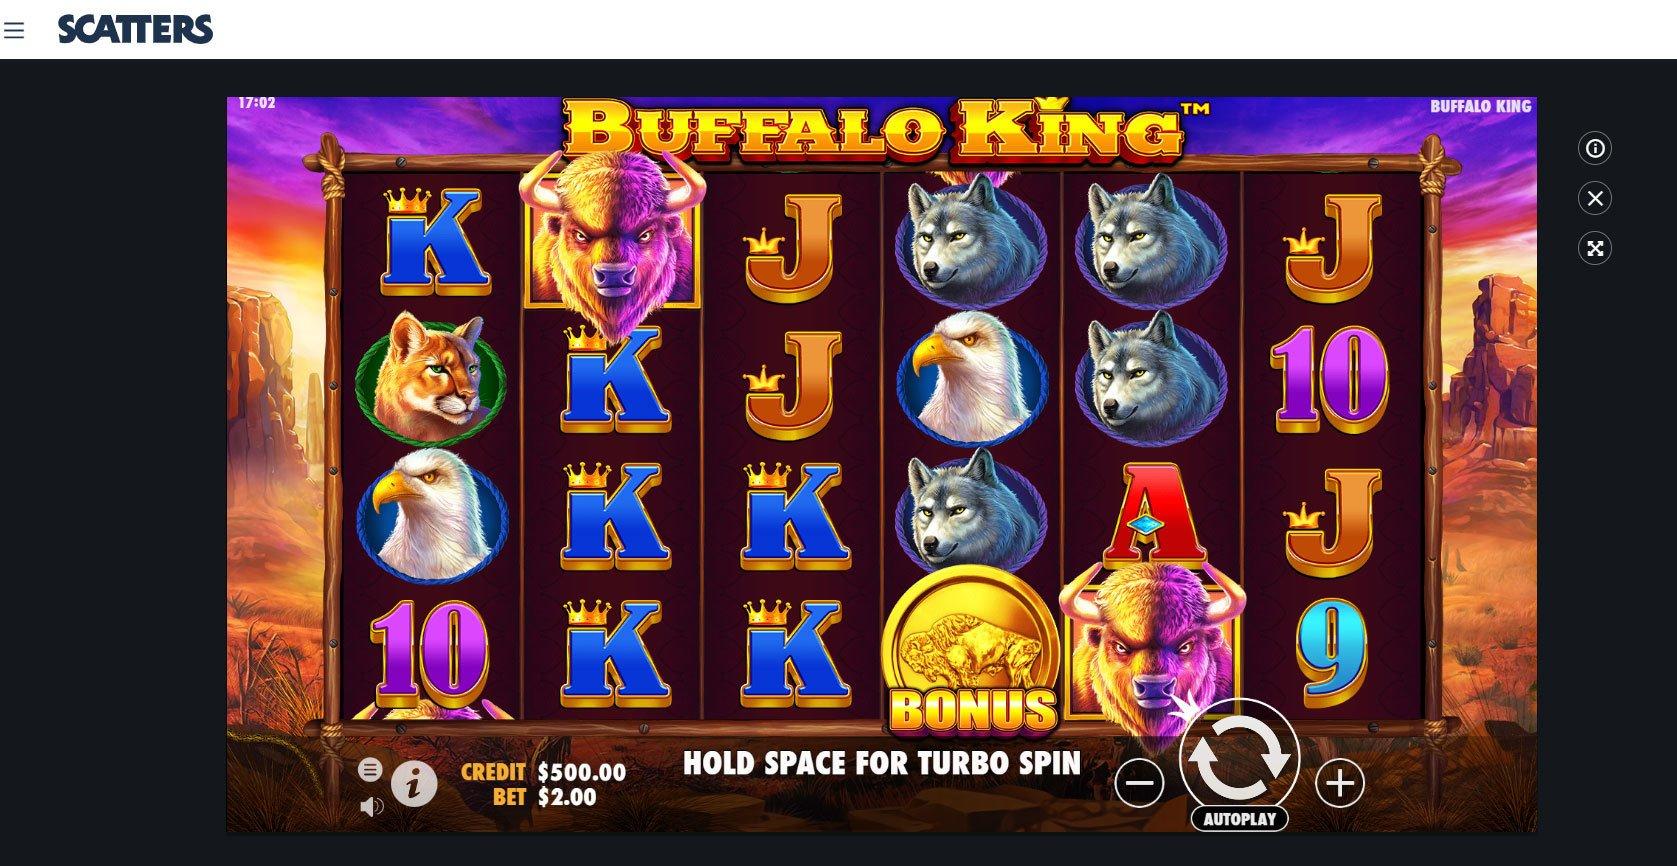 Buffalo King Online Slot by Pragmatic Play